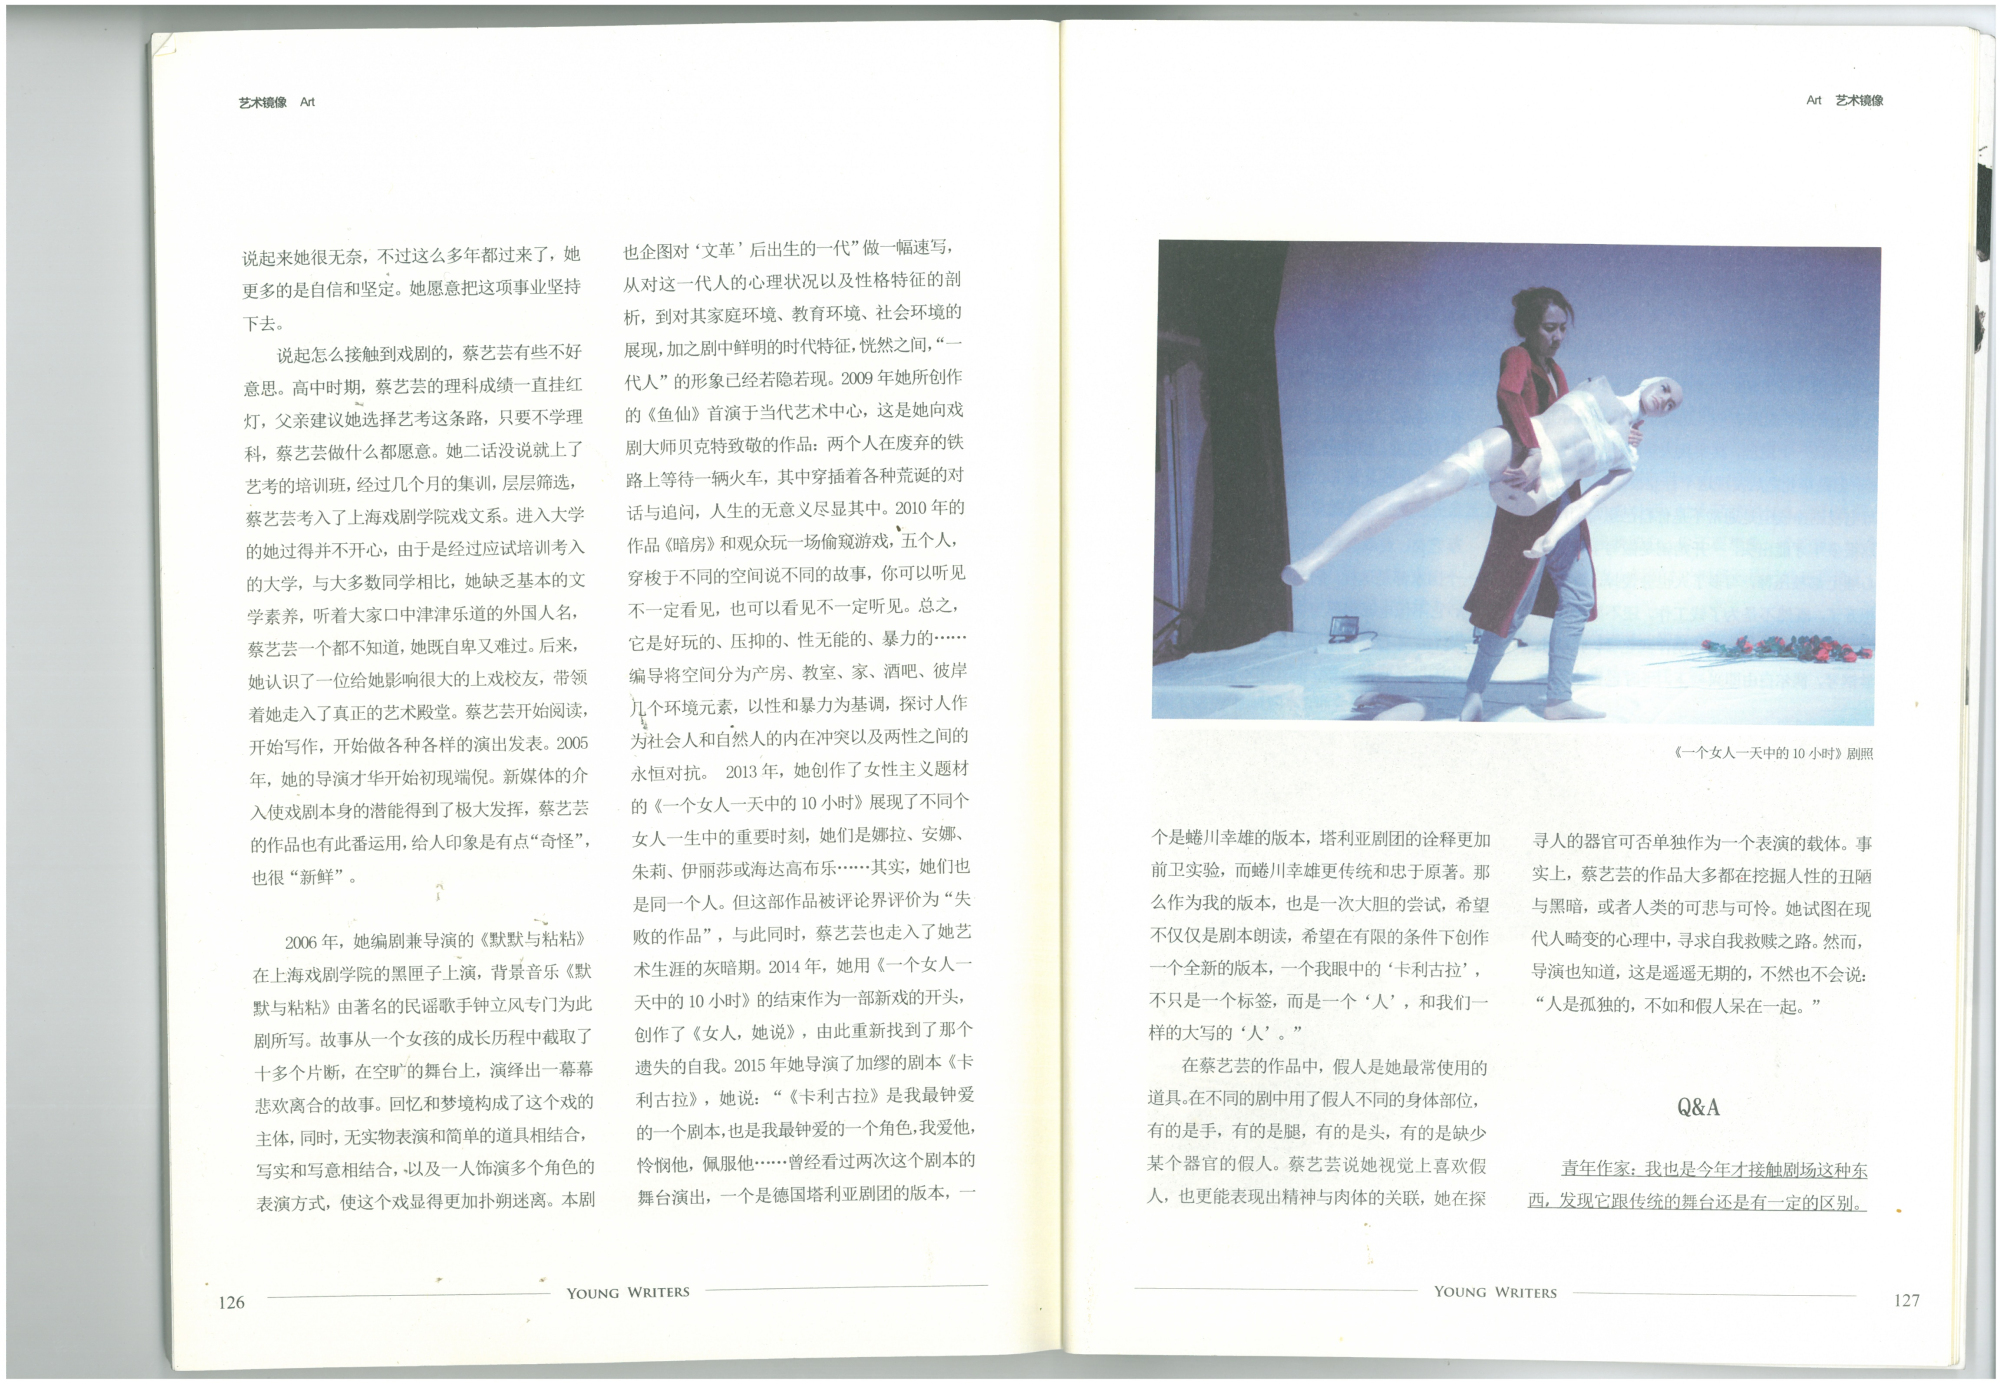 http://caiyiyun.com/files/gimgs/33_s45c-315081022580.jpg